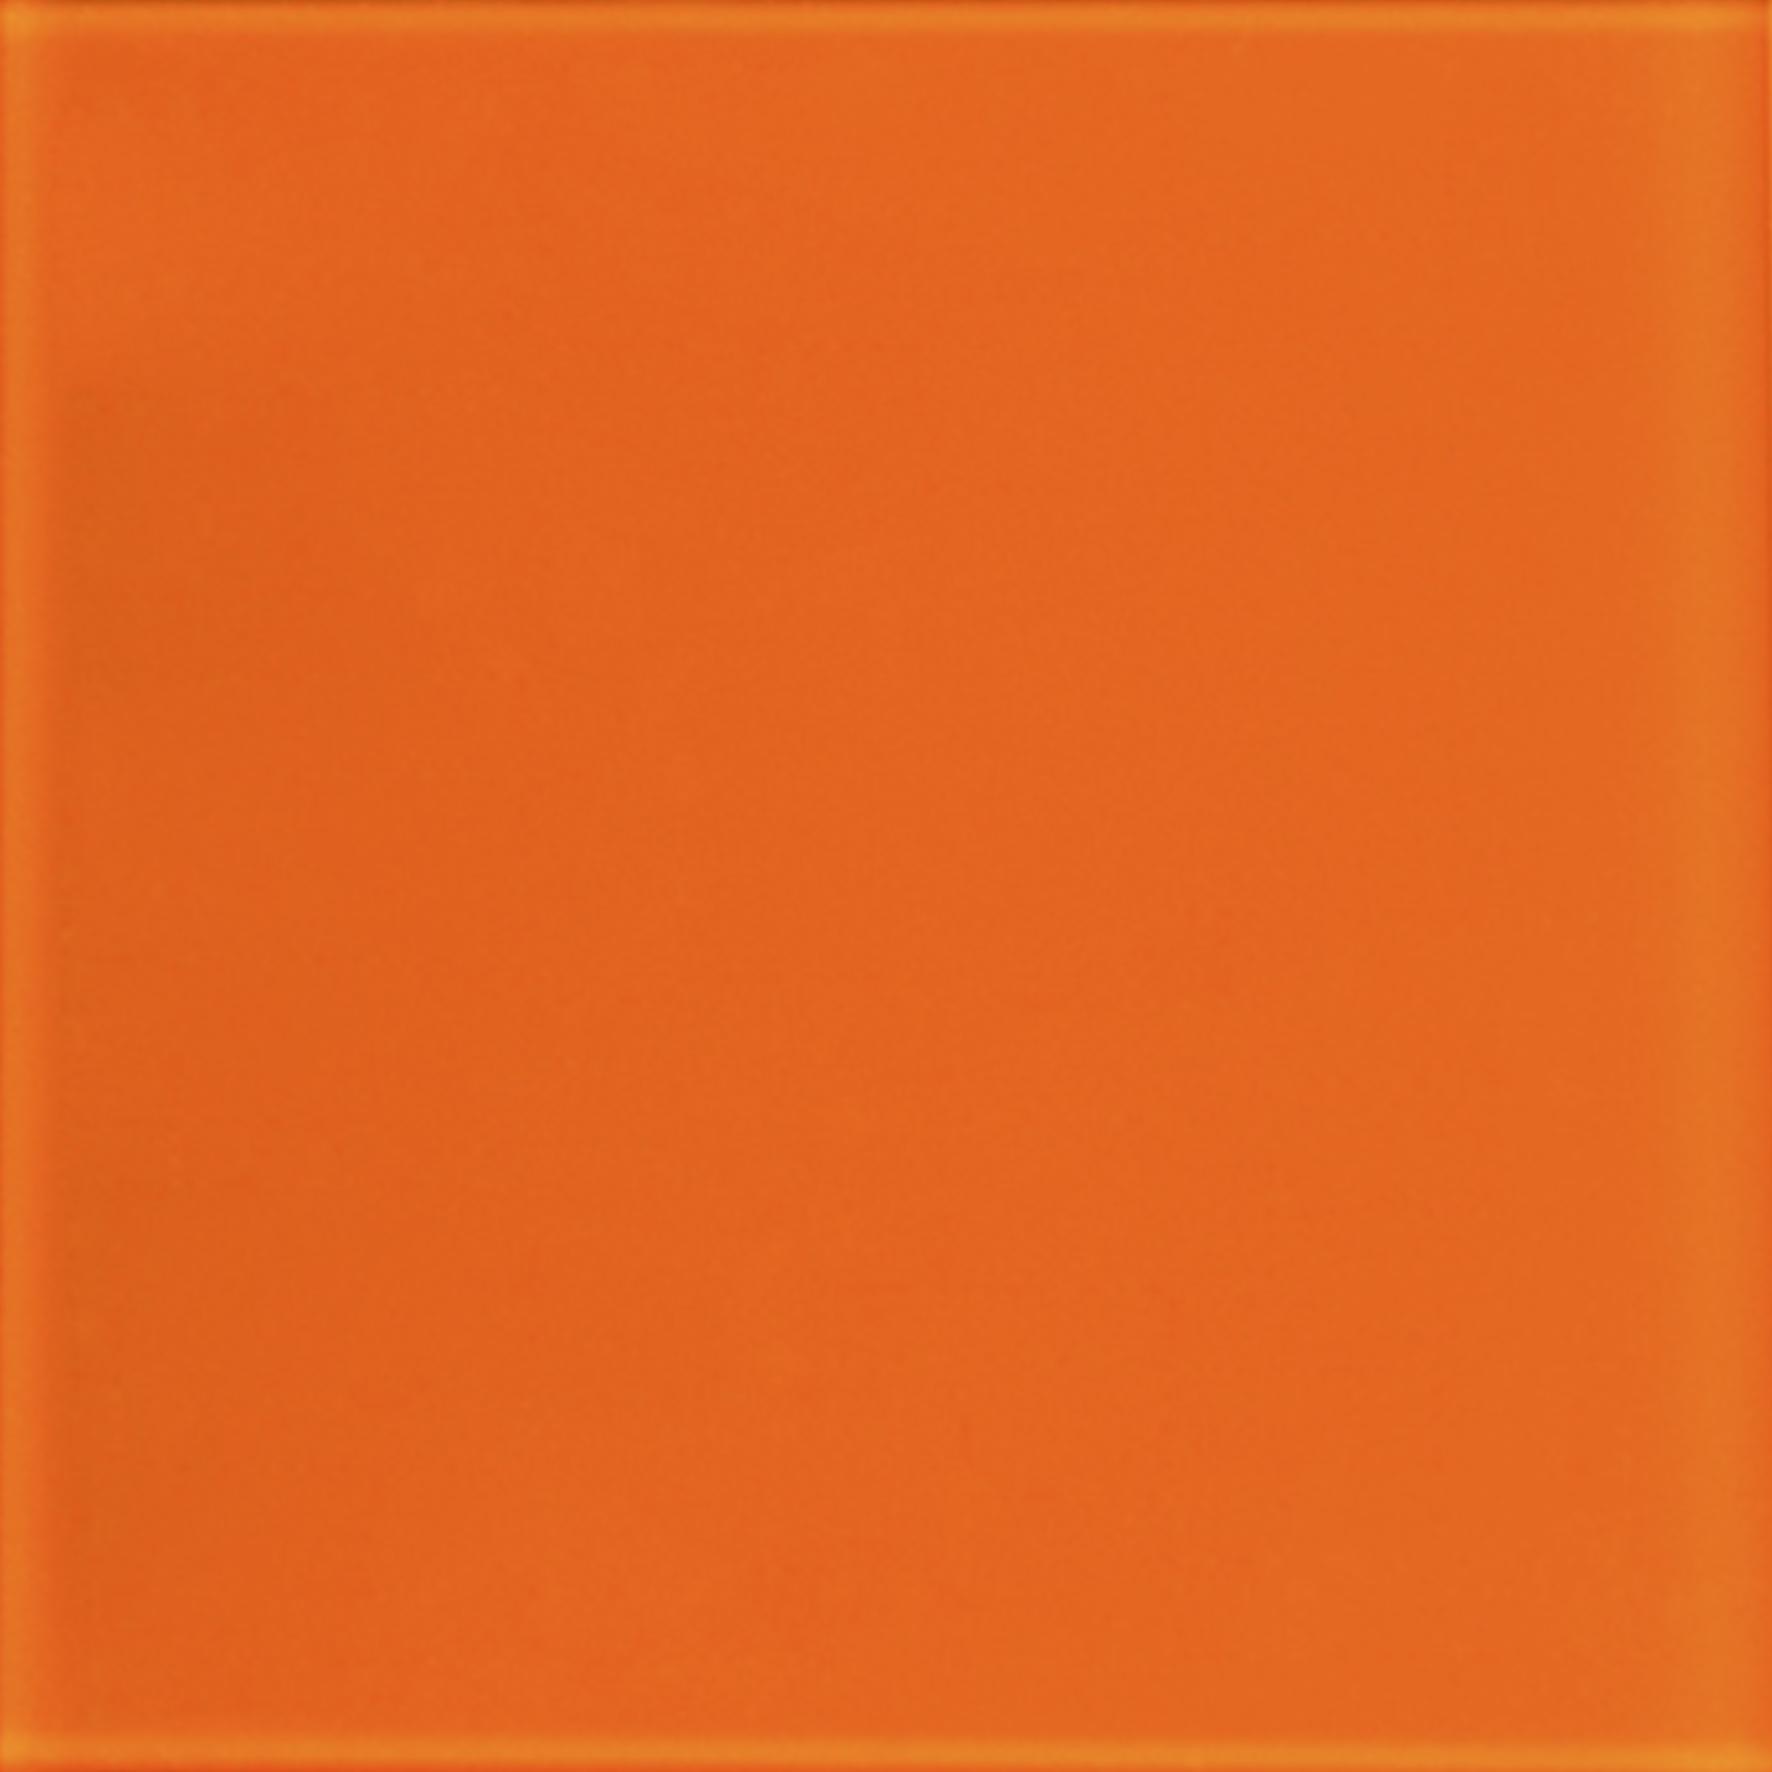 What Is Laminate Orange Brown Chelsea Artisans